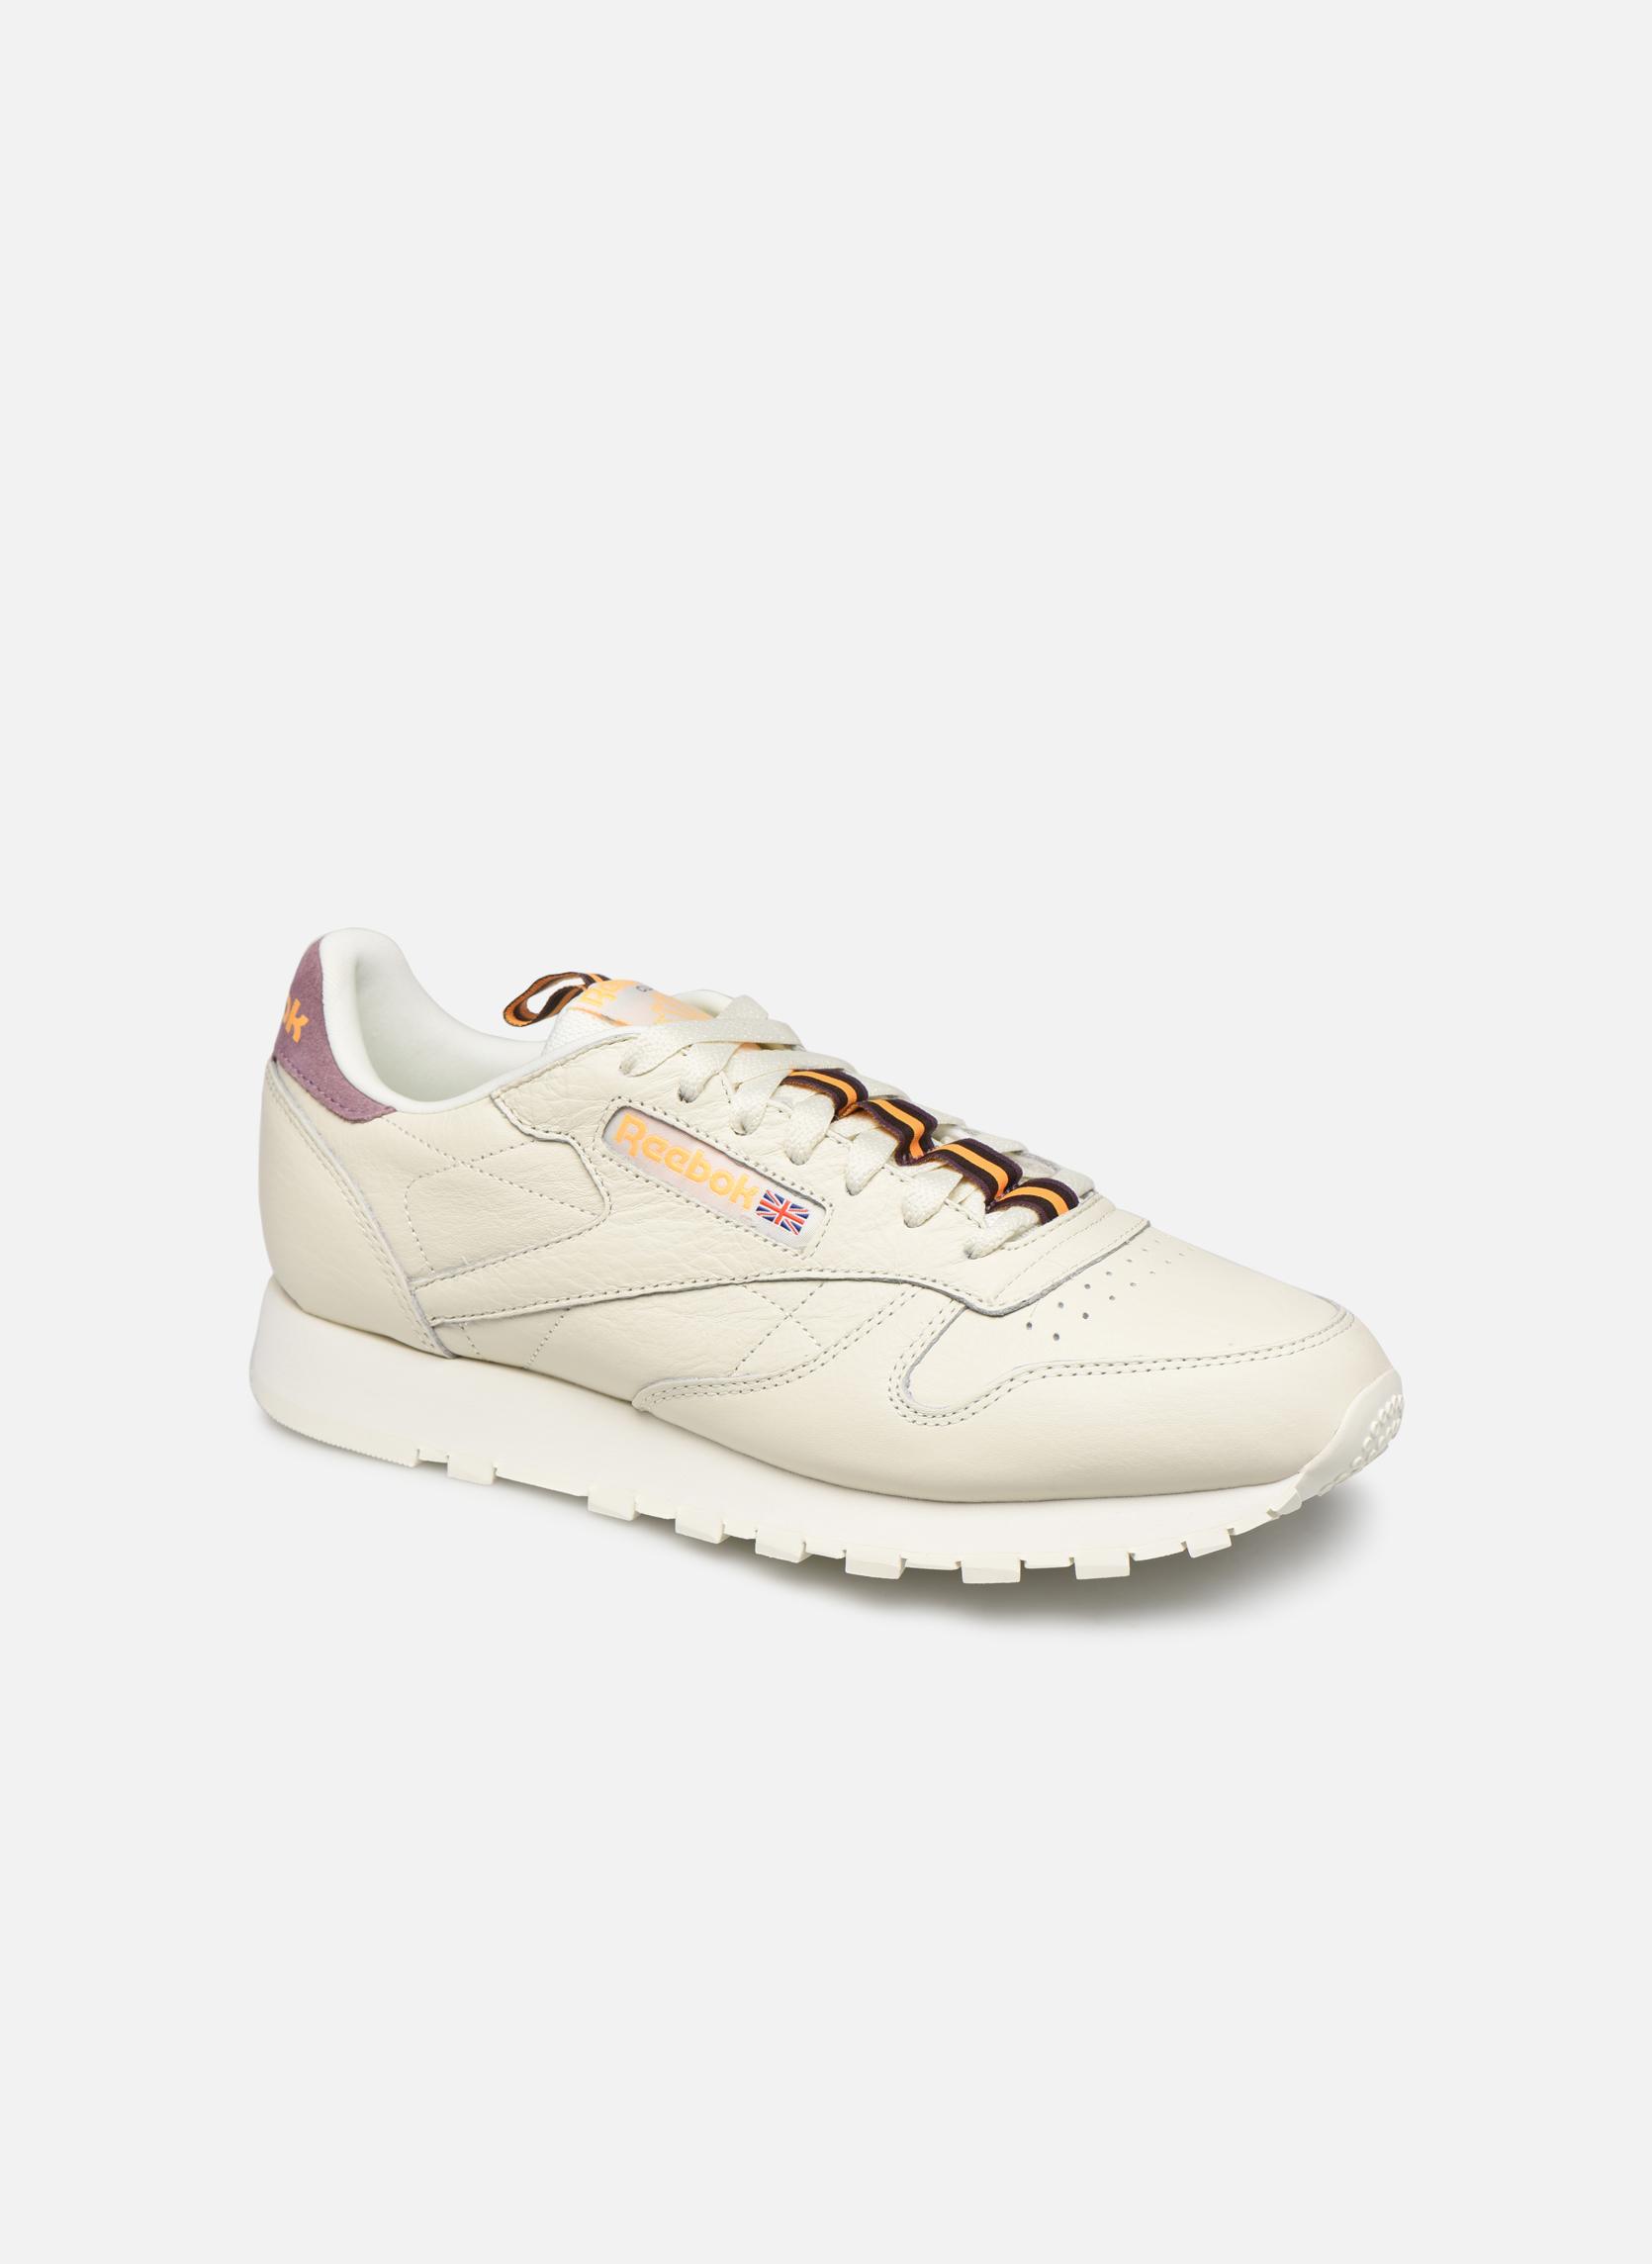 Sneakers Classic Leather MU by Reebok